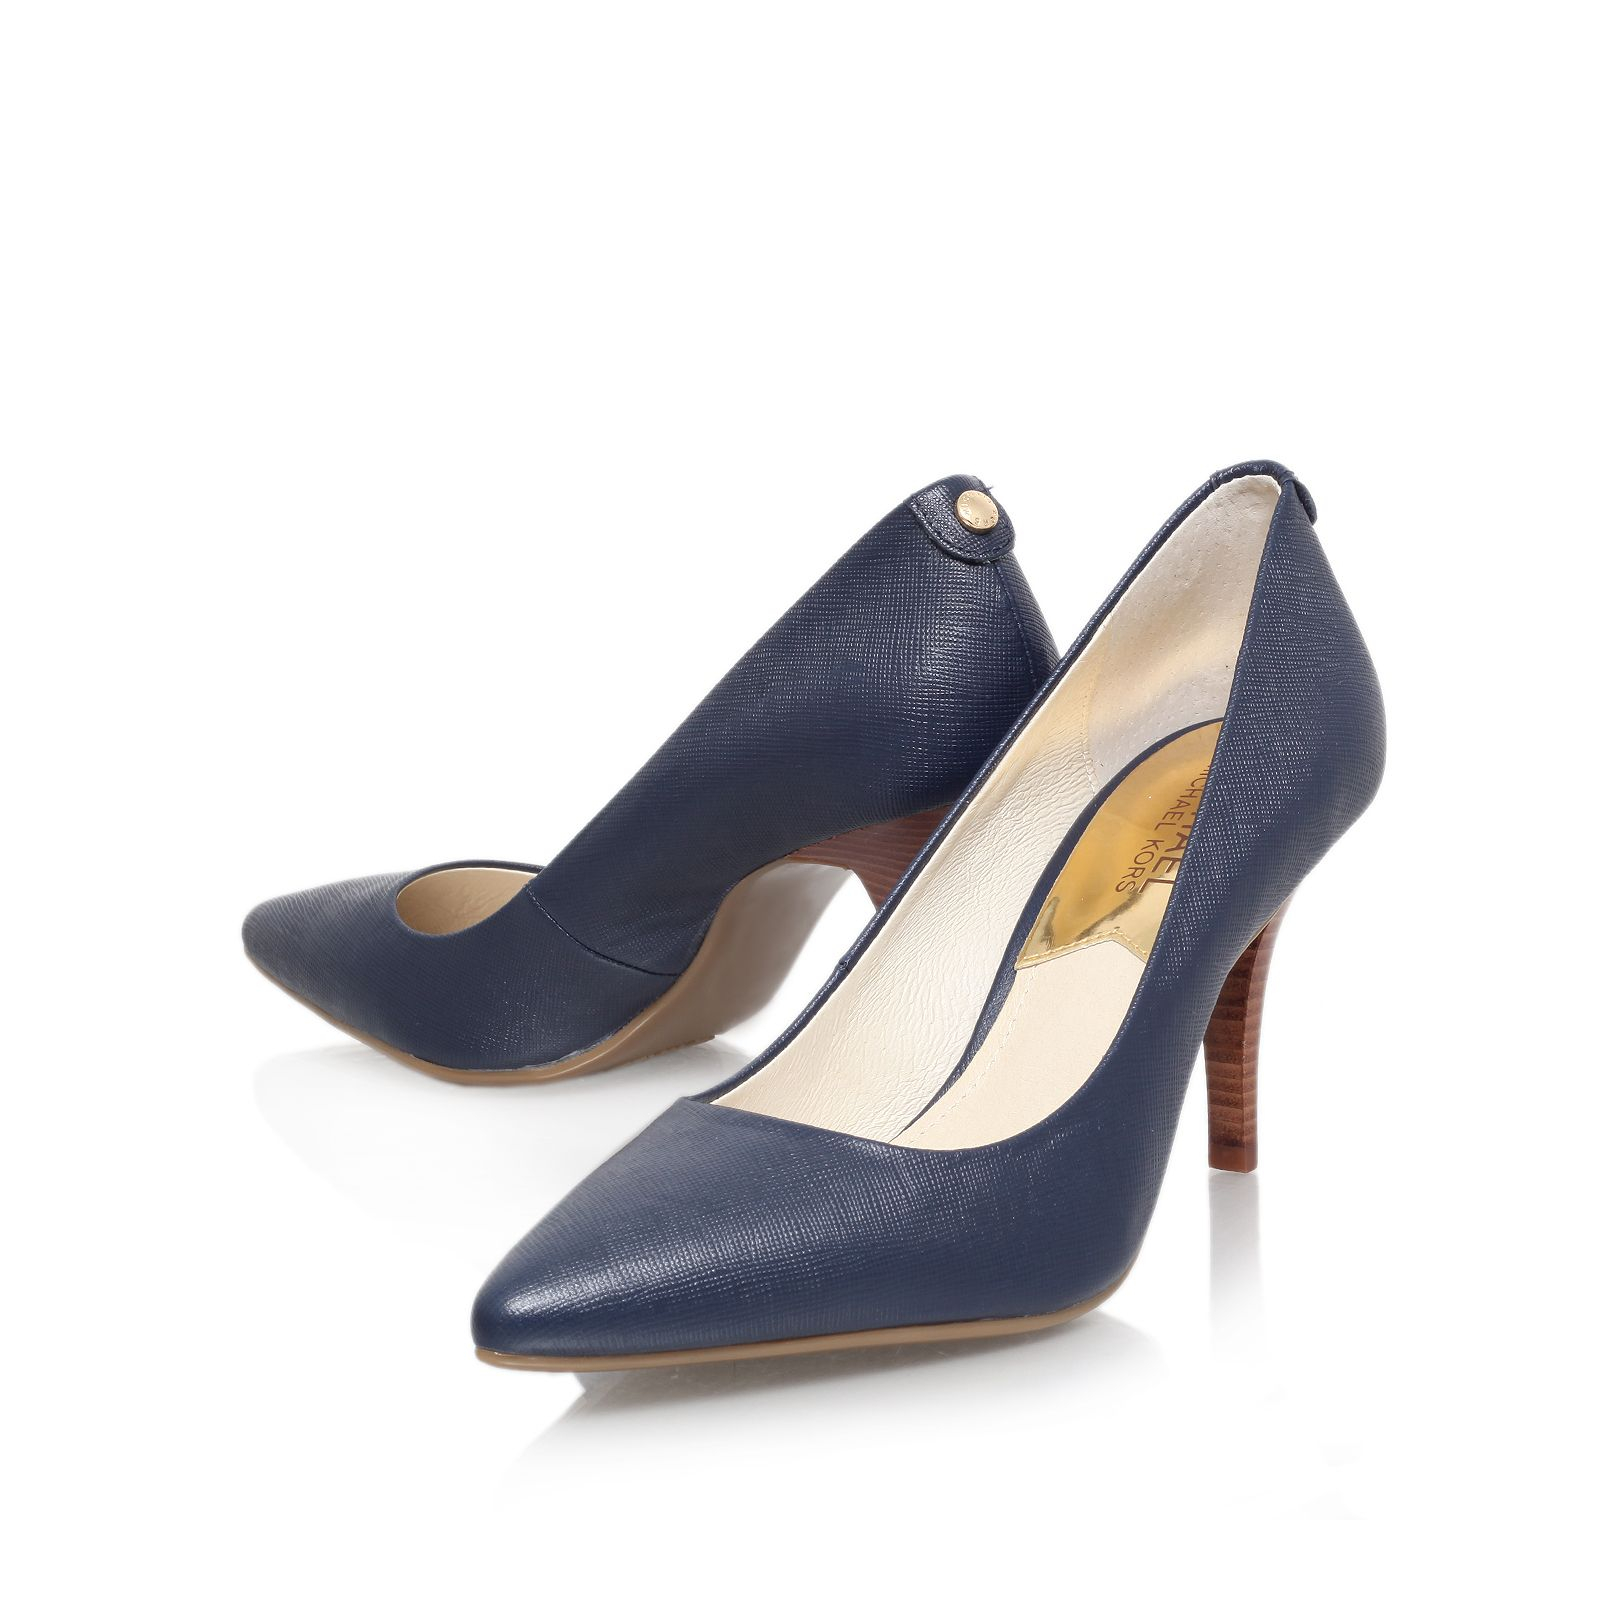 michael kors mk flex high heel court shoes in blue lyst